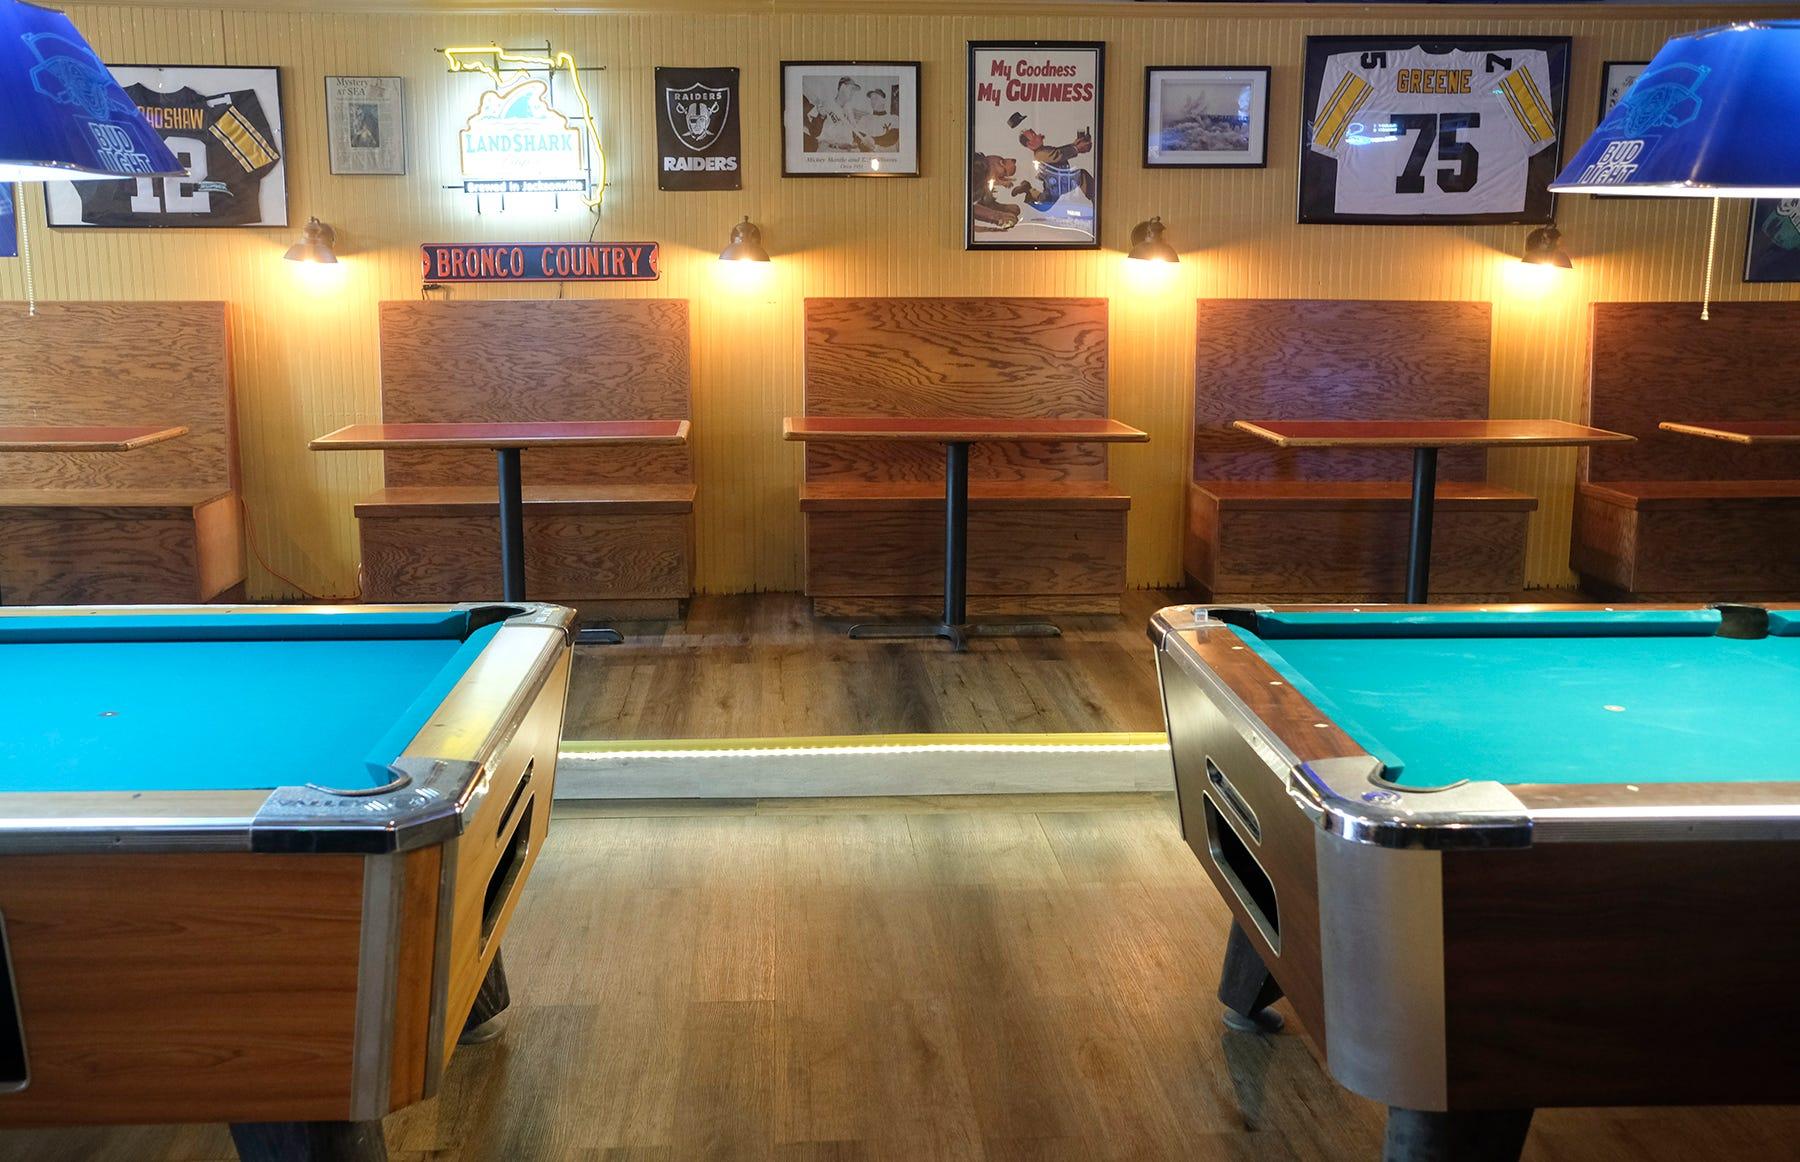 How to Buy A Pool Table Felt?